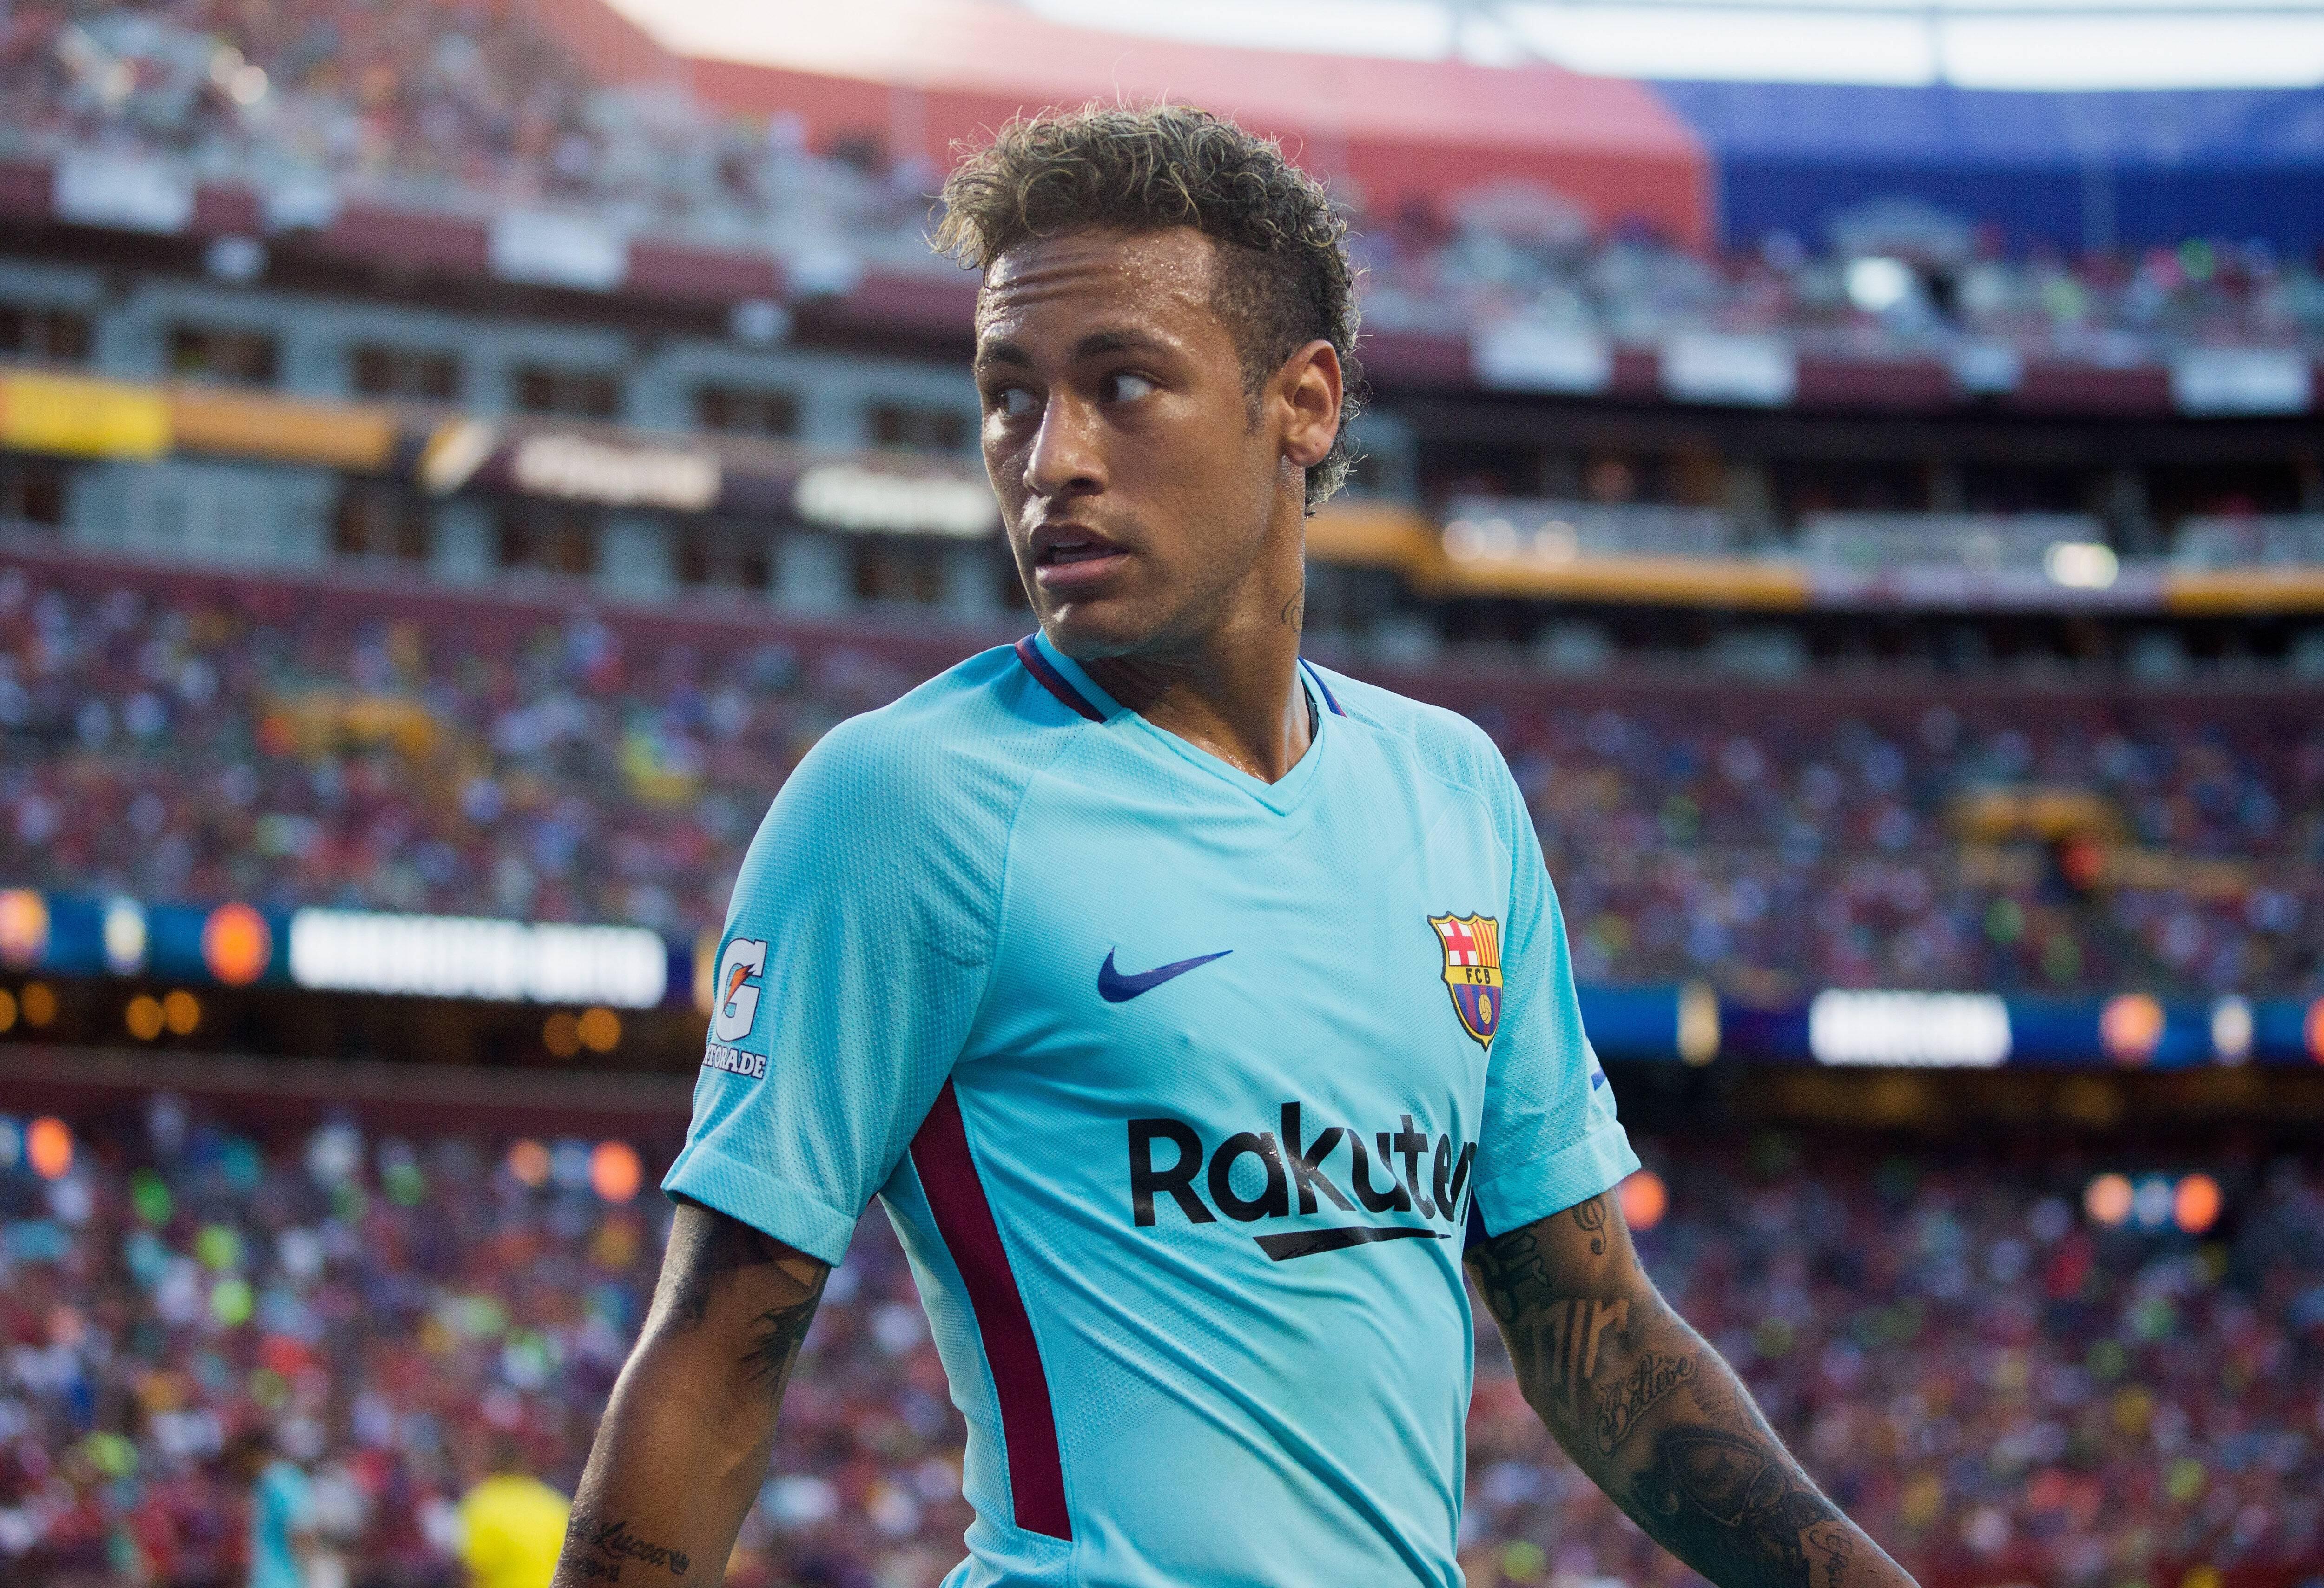 Bild zu Neymar, Paris St. Germain, FC Barcelona, Transfermarkt